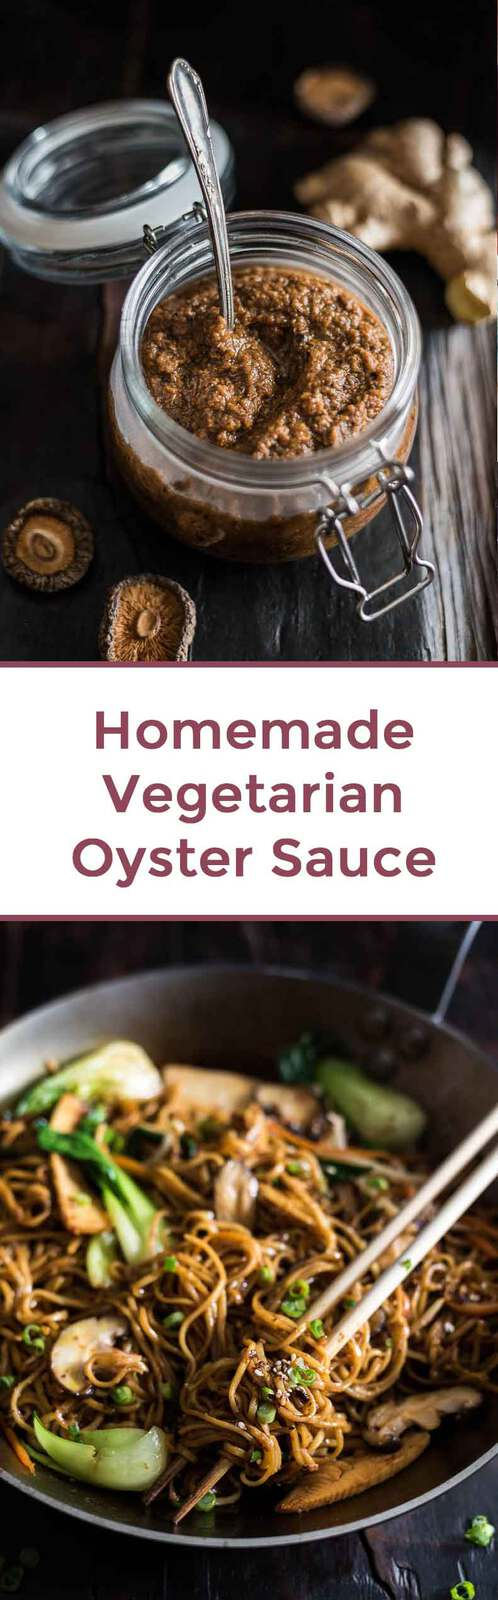 Homemade Vegetarian Oyster Sauce (Vegan Stir Fry Sauce) - Vegan | Vegetarian | Stir Fry | Sauce | Chinese Food | Gluten-Free